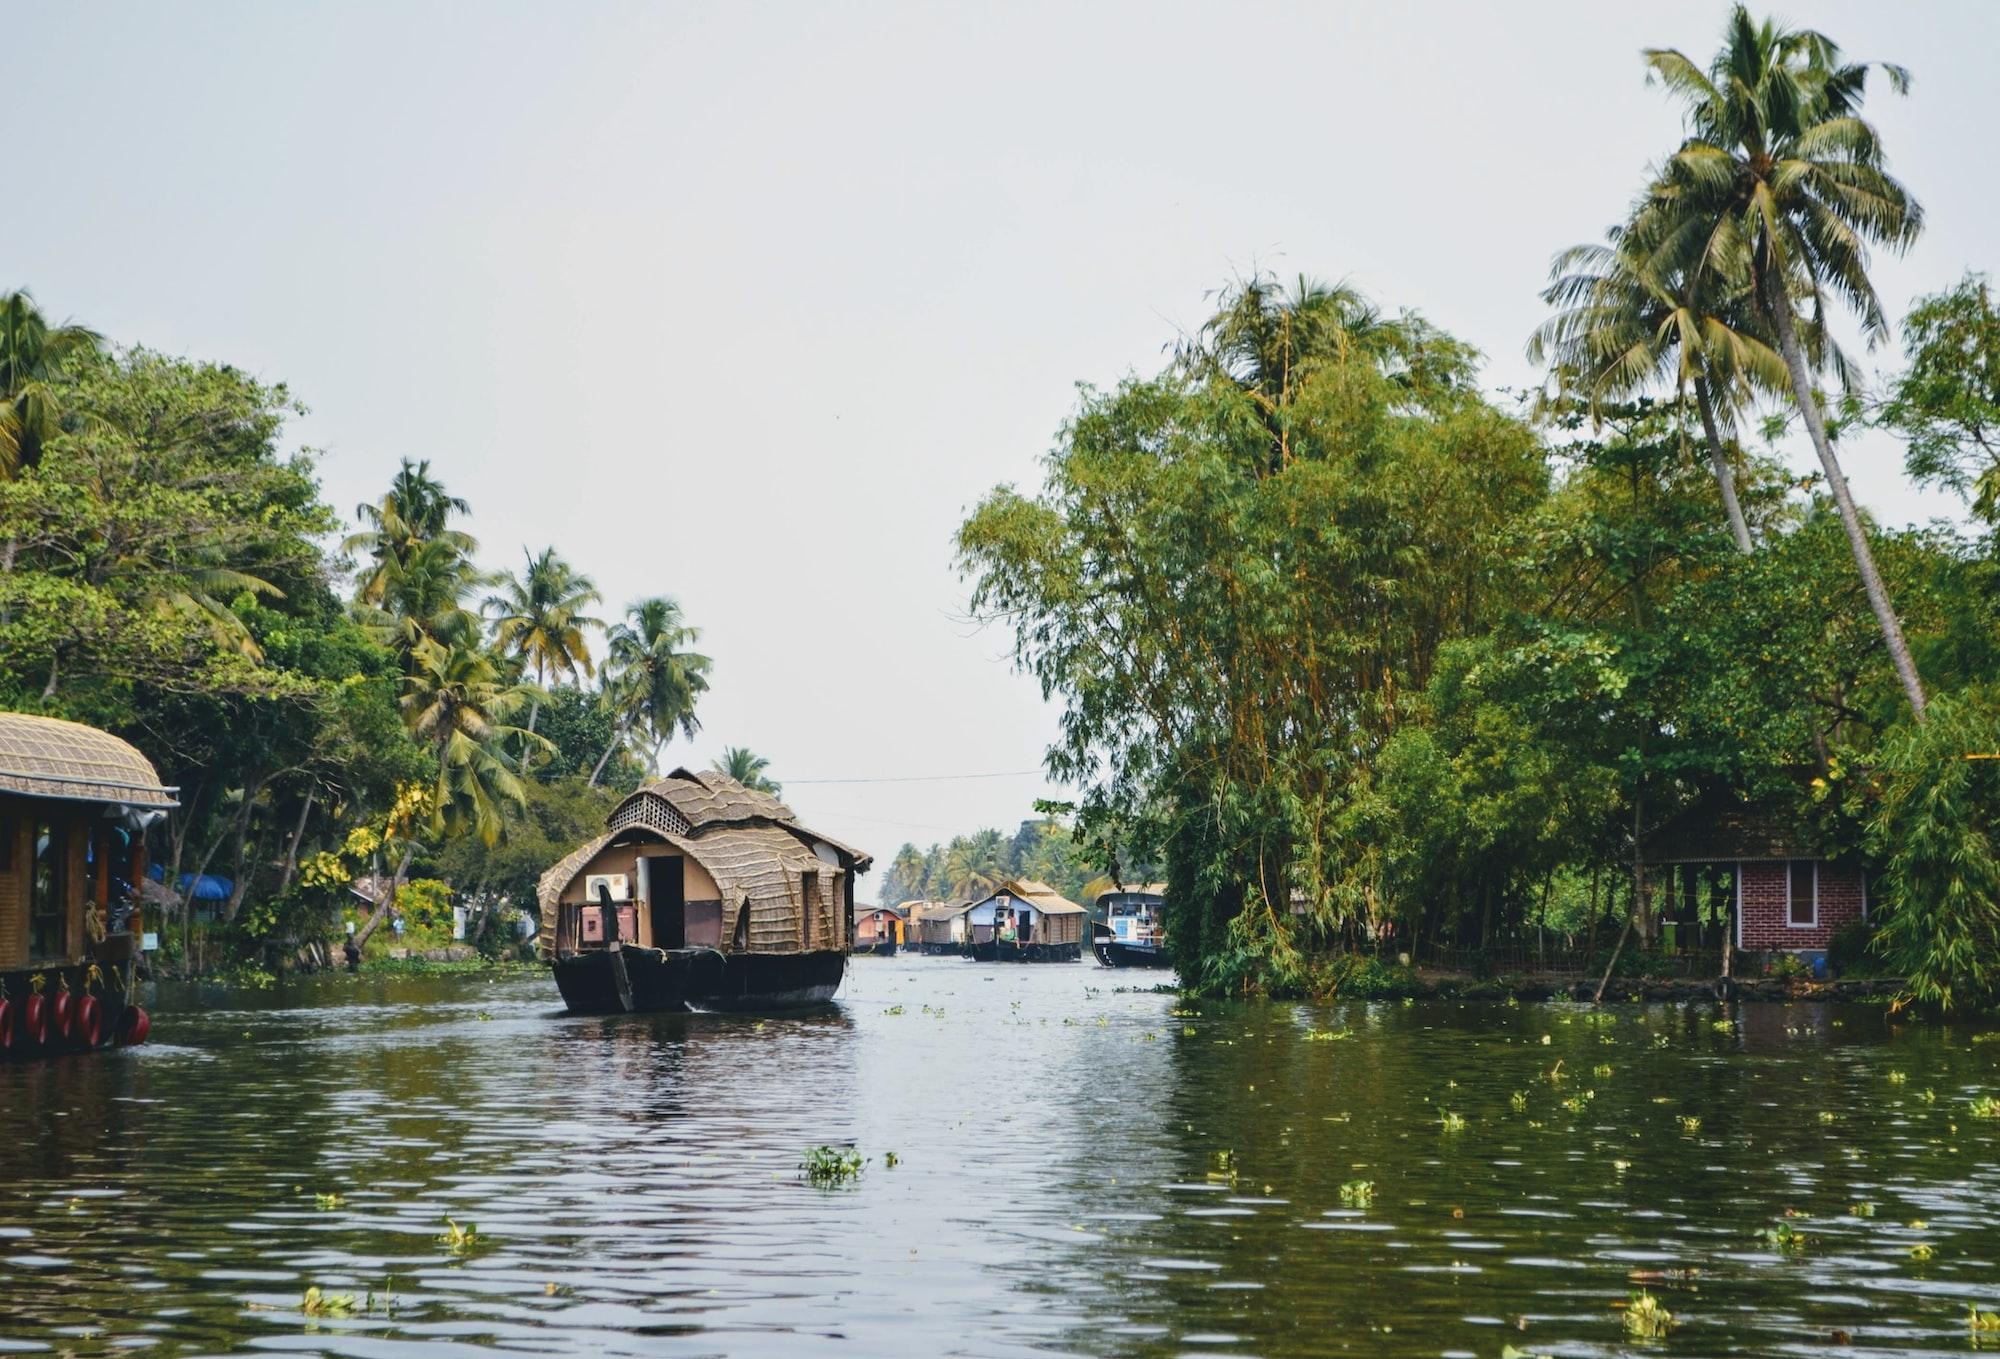 Backwaters in Alleppey. Kerala, India